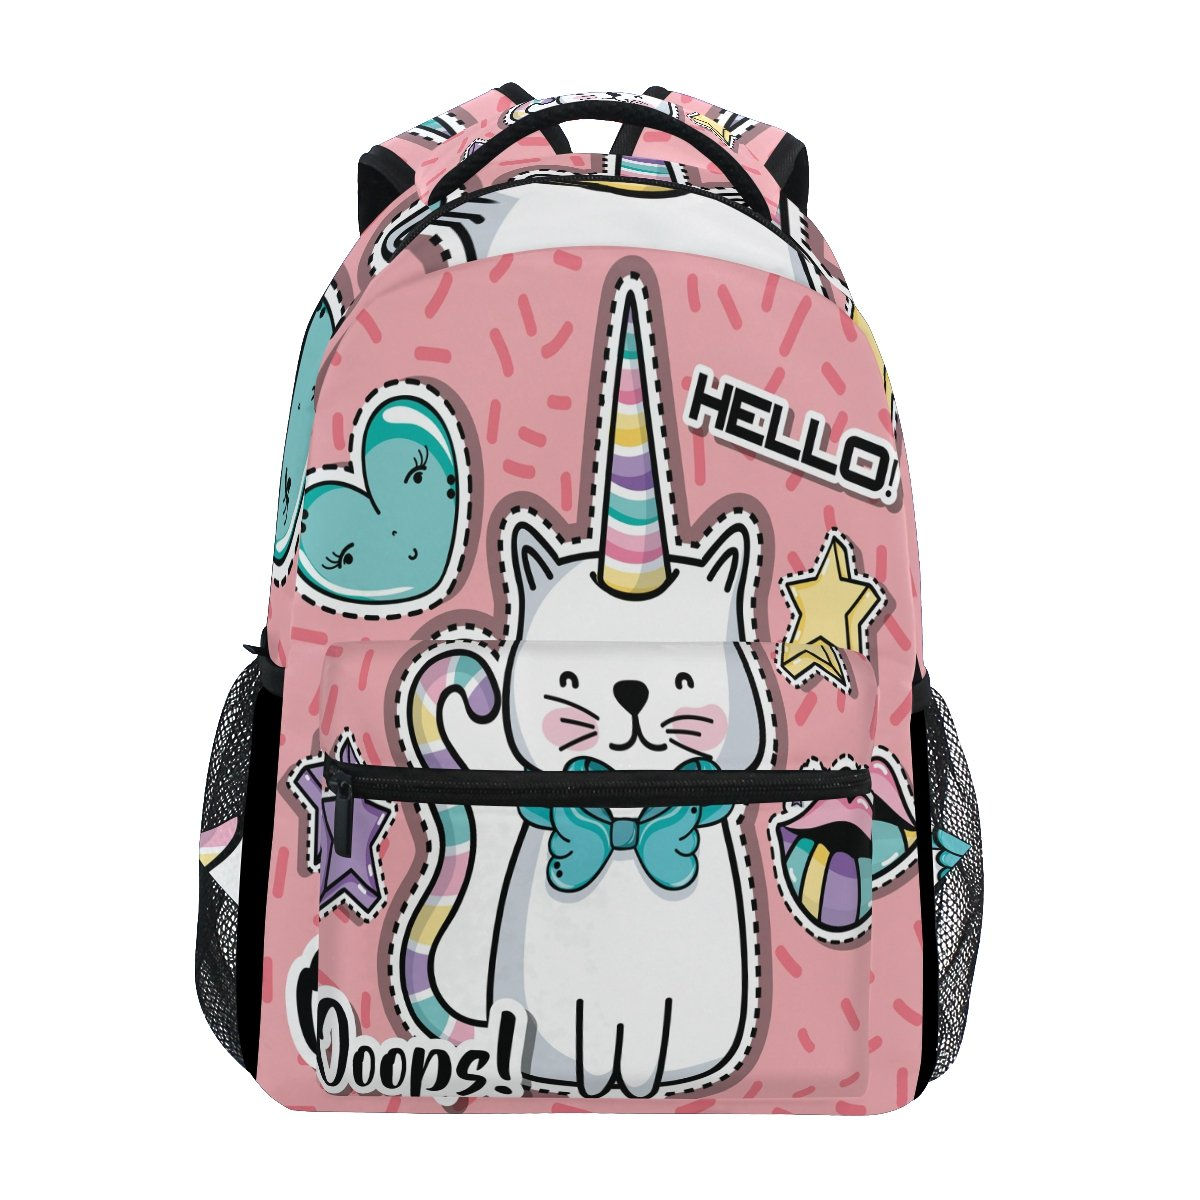 e5274cc751 Amazon.com  TropicalLife Fashion Cute Girl Unicorn Hello Backpacks School  Bookbag Shoulder Backpack Hiking Travel Daypack Casual Bags  Computers   ...